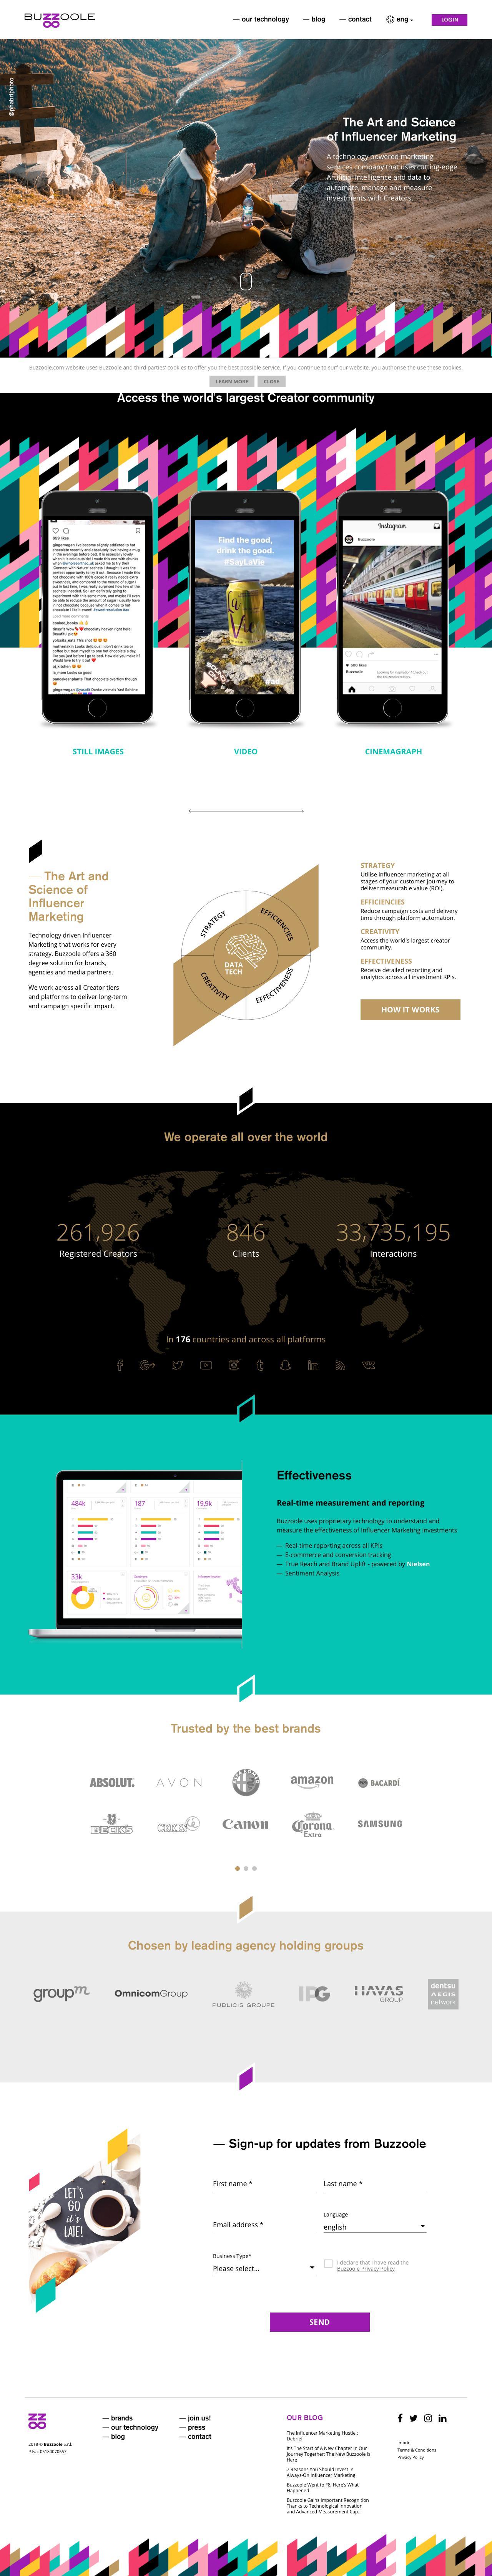 Screenshot of buzzoole.com - Influencer Marketing Platform        | Buzzoole - captured June 1, 2018